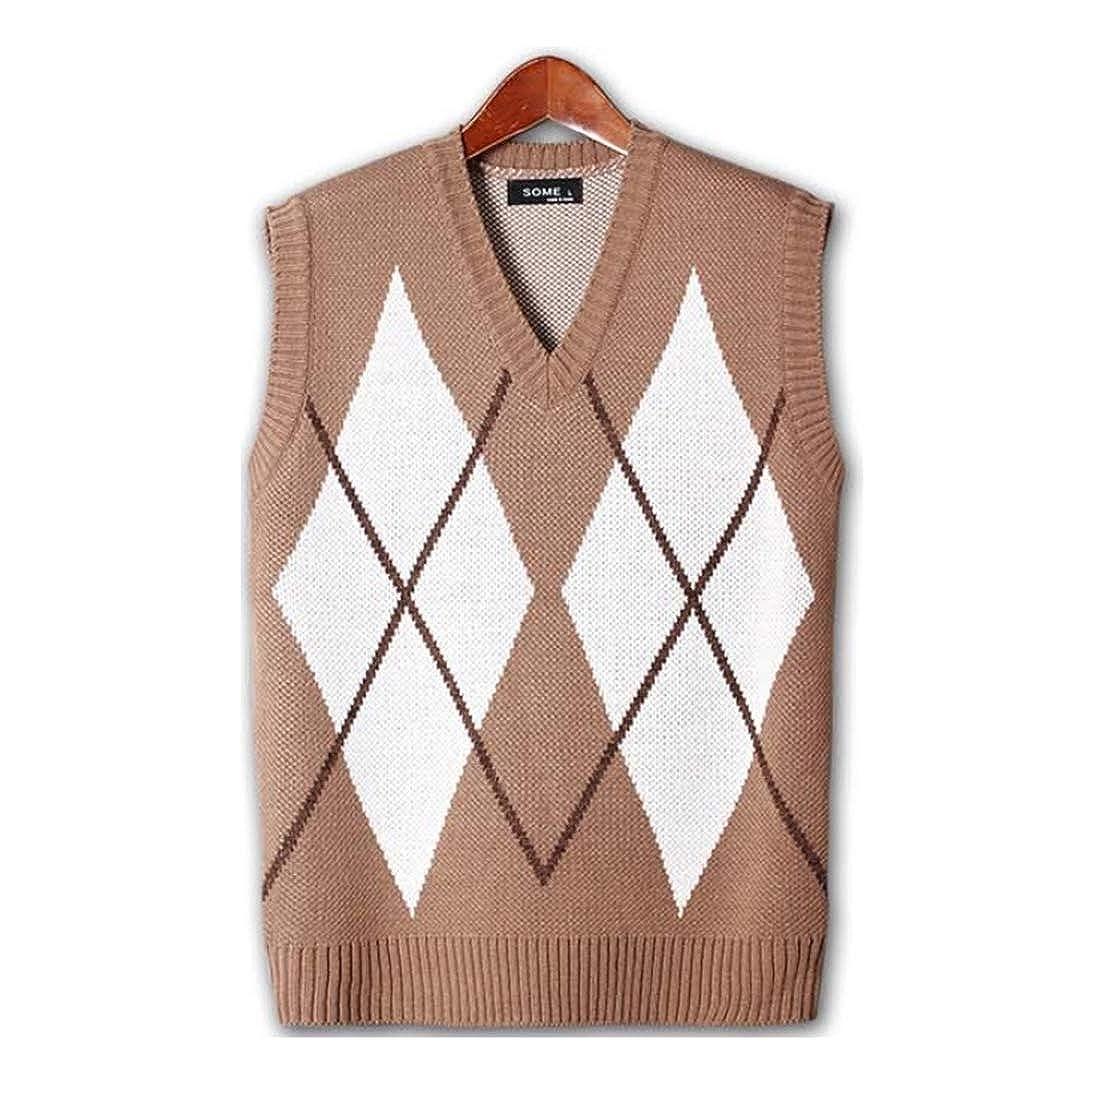 Mens Premium X Diamond V Neck Button Knit Cardigan Sweater Jumper